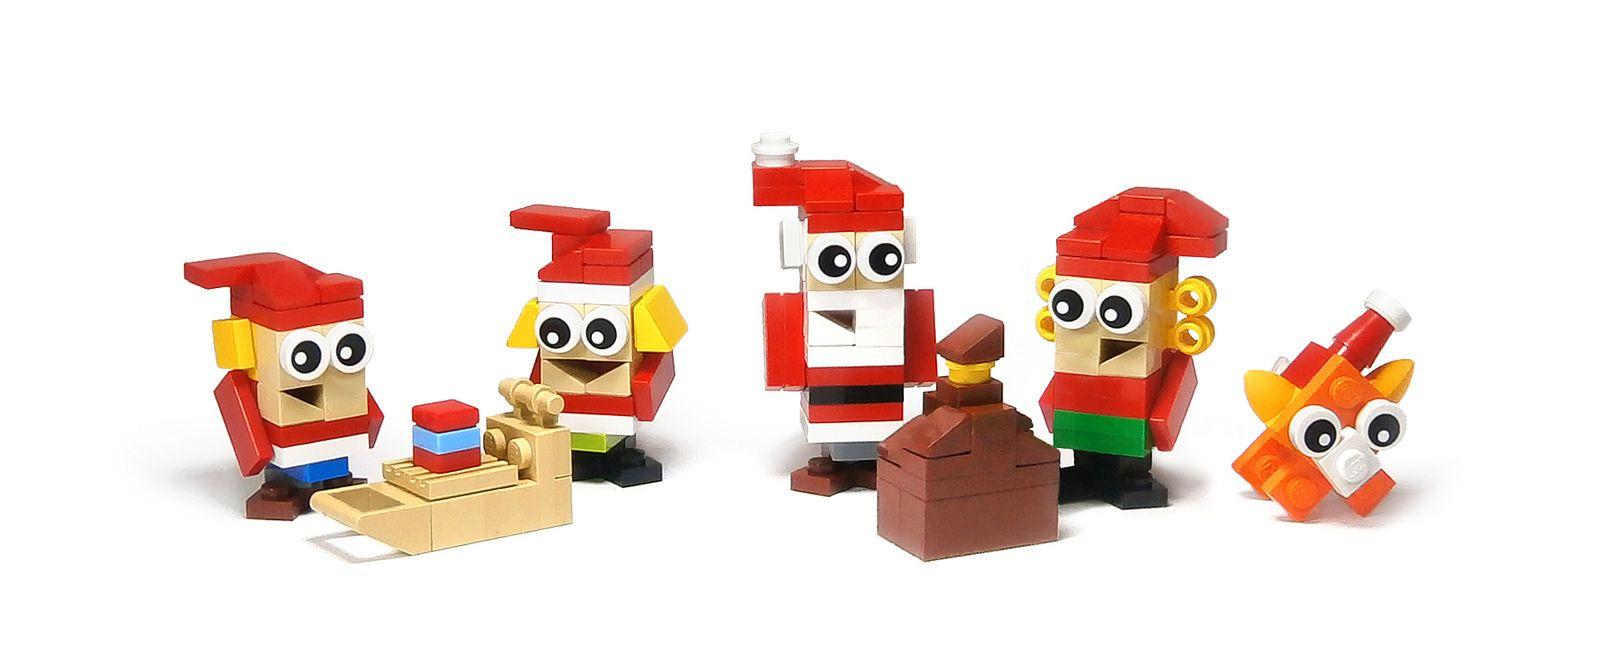 The Santa Family Cool lego creations, Lego christmas